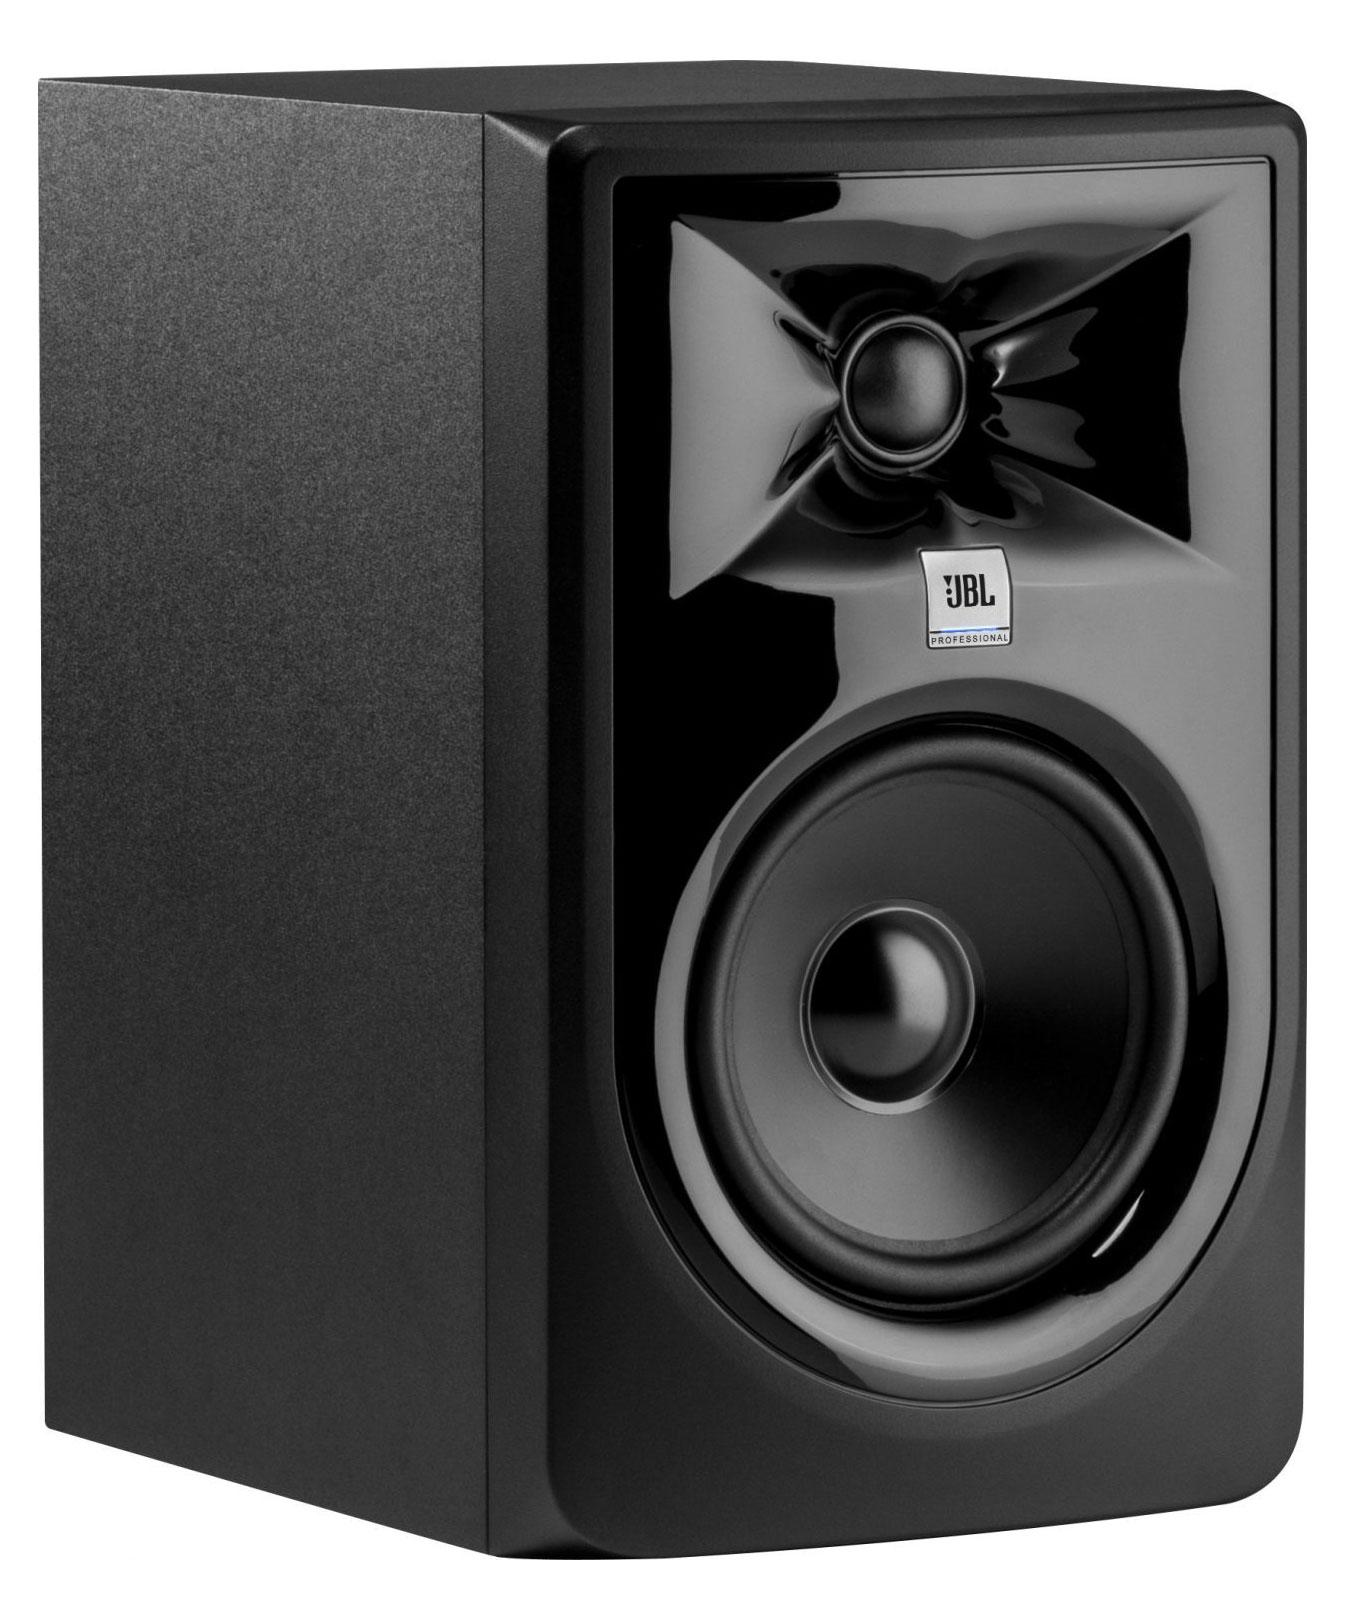 Studiomonitore - JBL 305P MKII Aktiv Studiomonitor - Onlineshop Musikhaus Kirstein